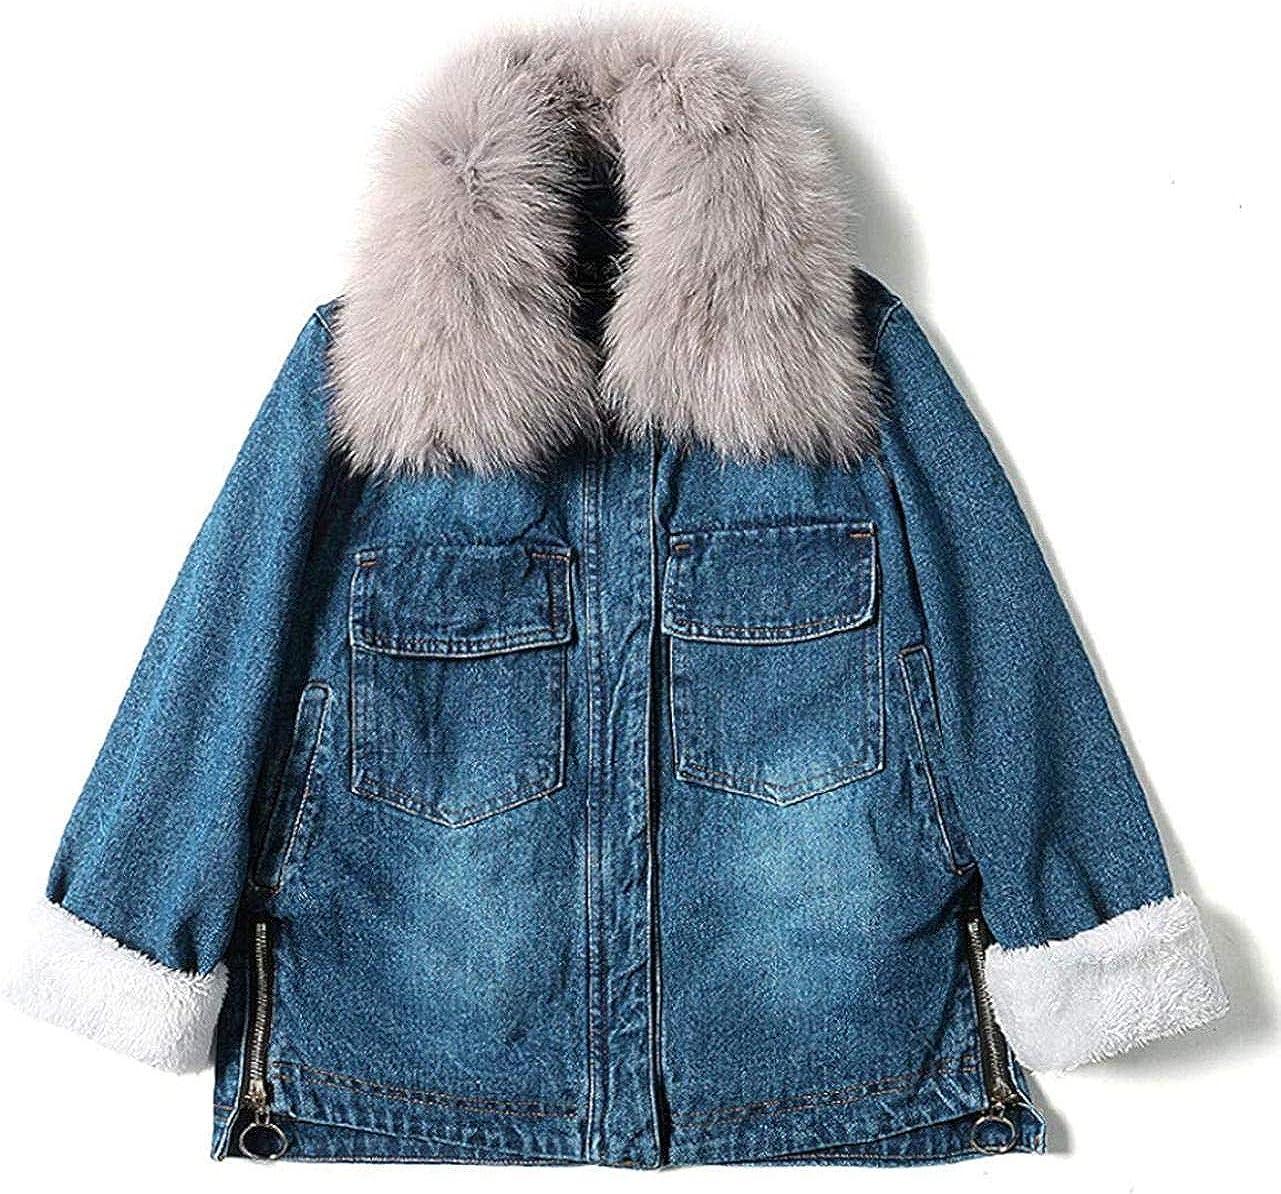 Women's Fashion Faux Fur Collar Fleece Lined Distressed Denim Jacket Coat